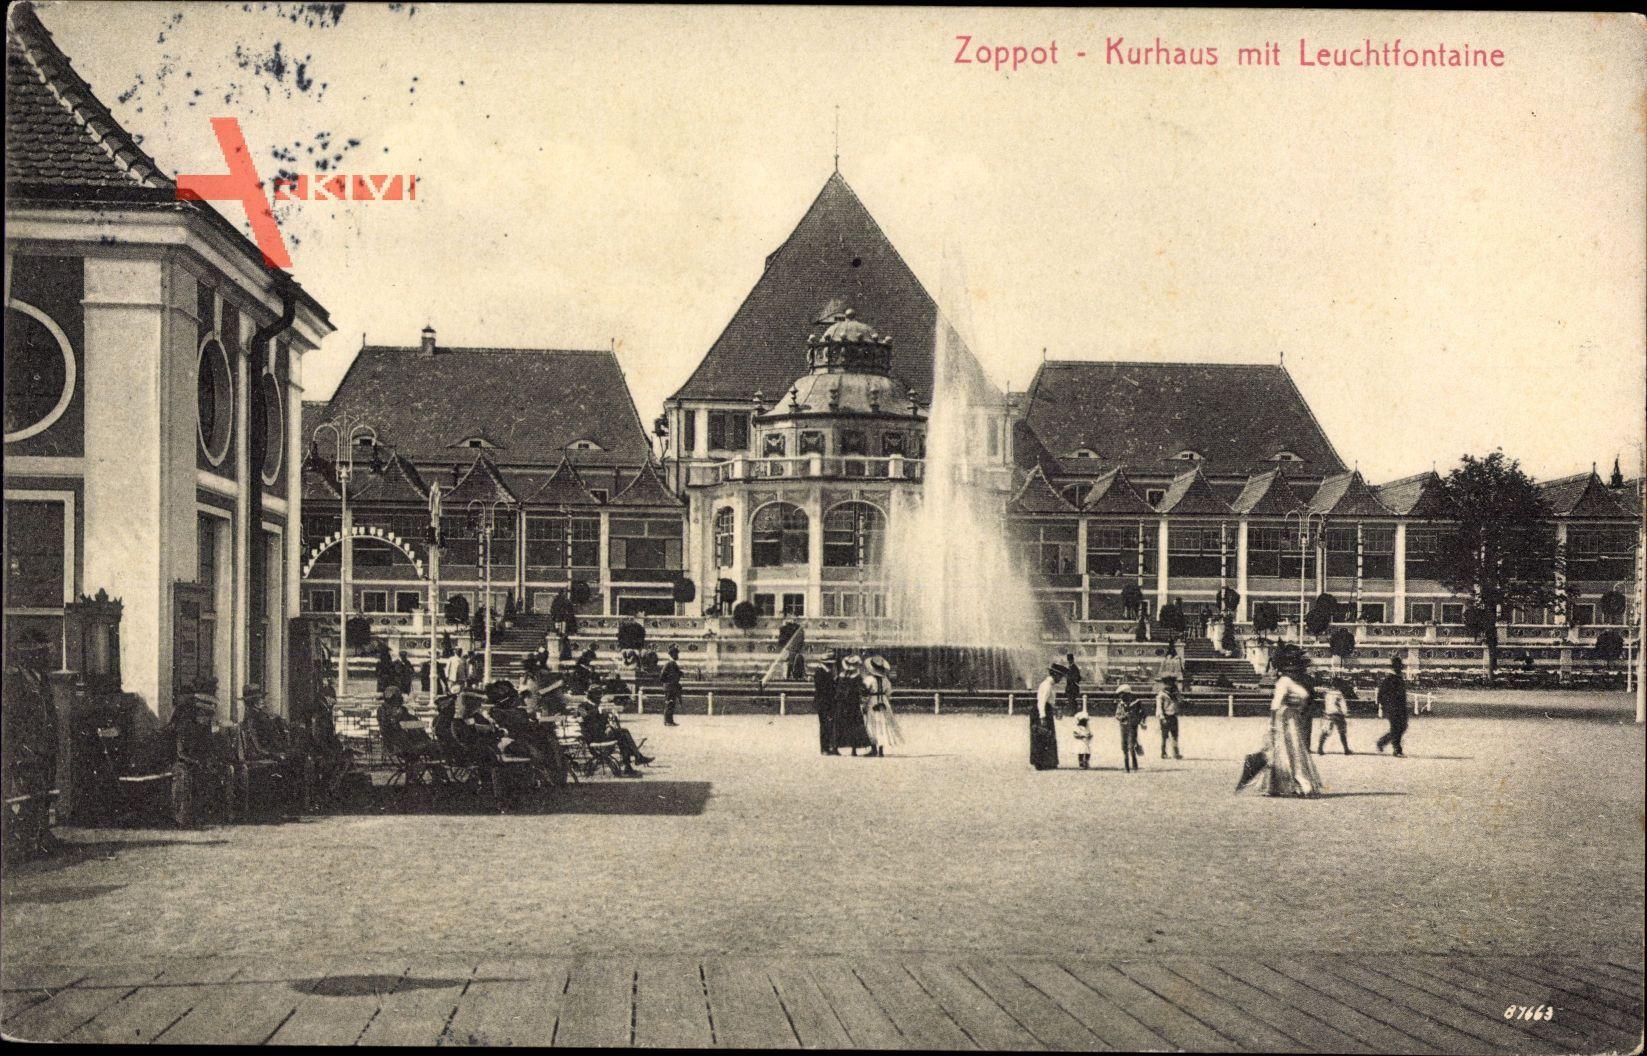 Sopot Gdańsk Zoppot Danzig, Blick auf Kurhaus mit Leuchtfontaine